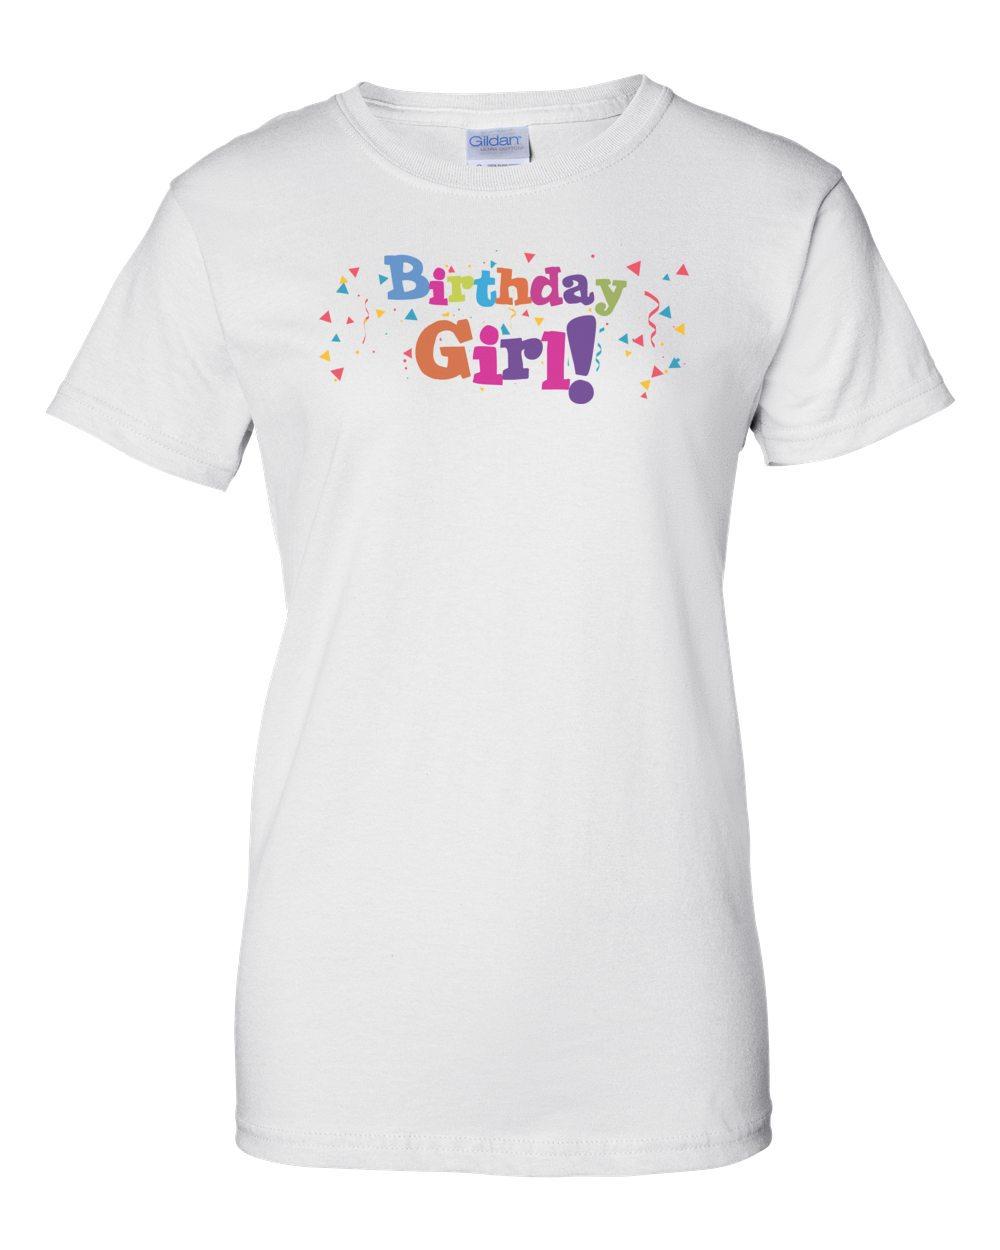 212a48de Birthday Girl - Happy Birthday shirt